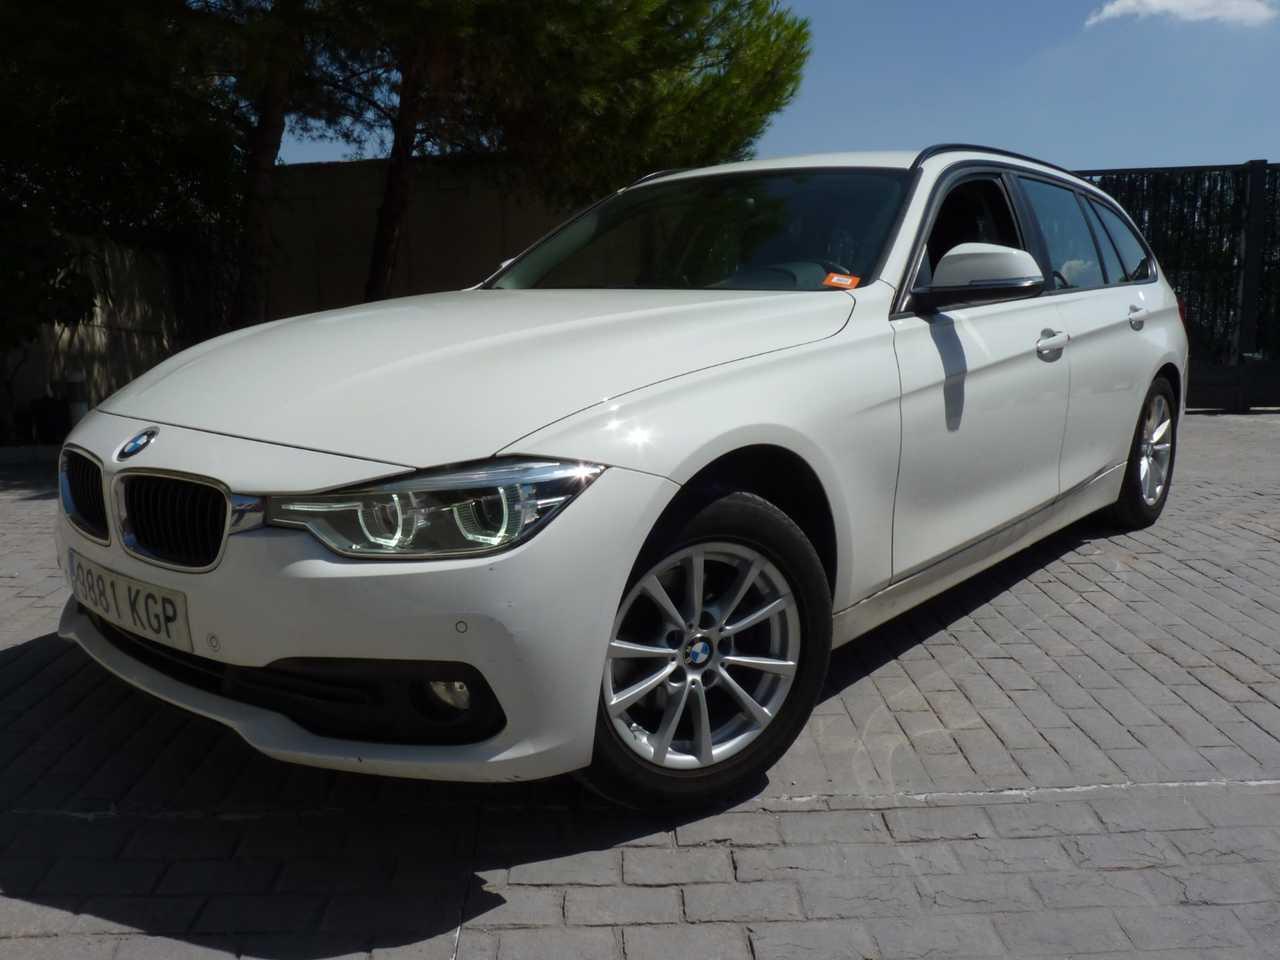 BMW Serie 3 Touring 2.0 dA 150 CV   - Foto 1